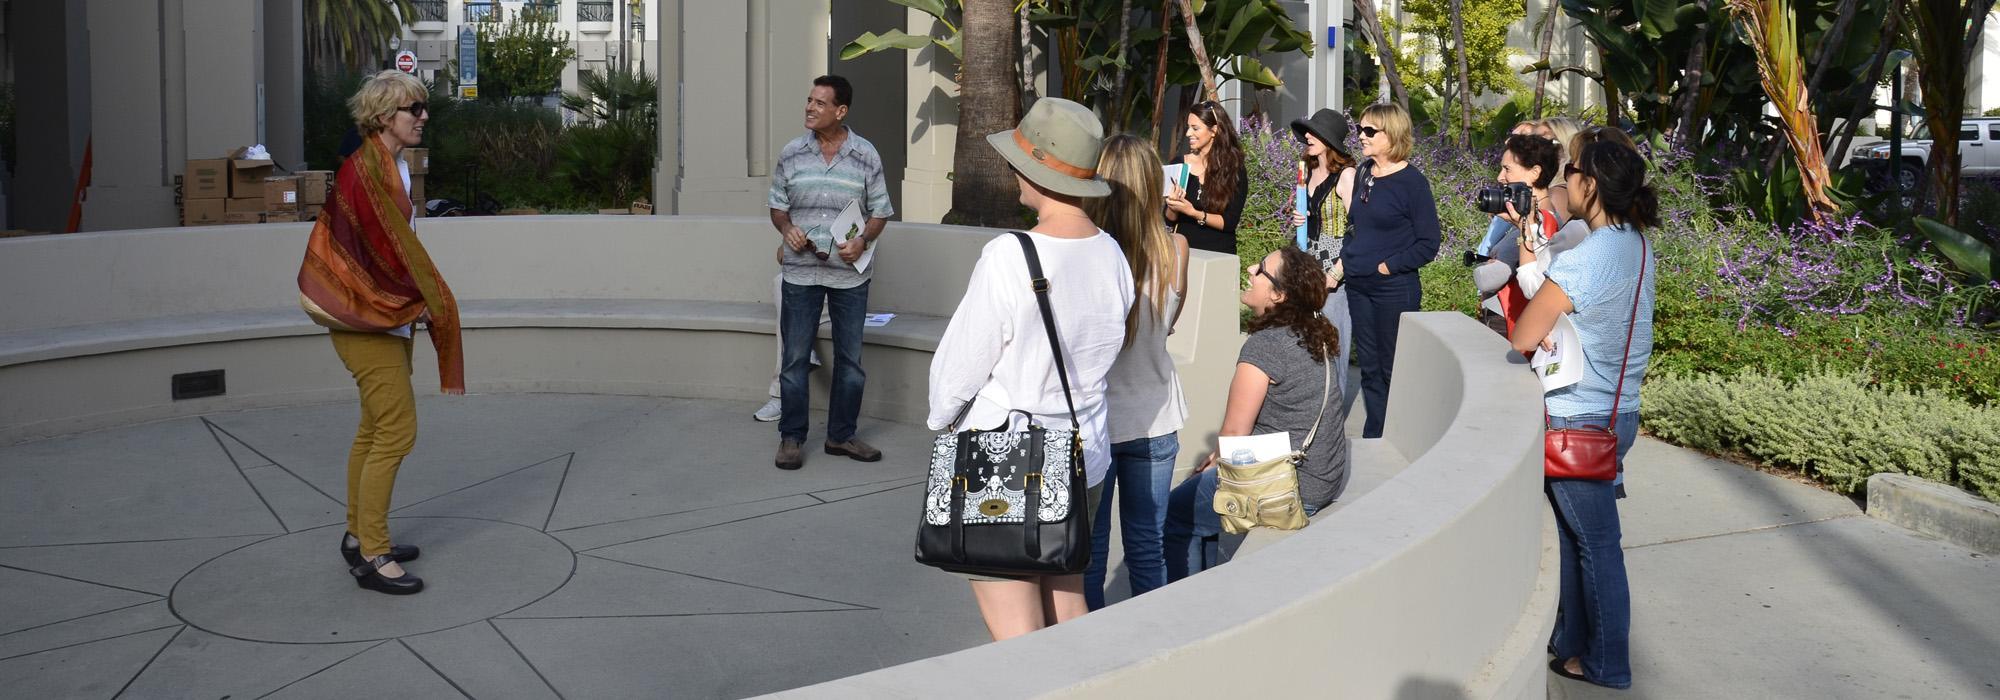 WOTW_LA_BeverlyHillsCC_hero_NoelVernon_2013.jpg